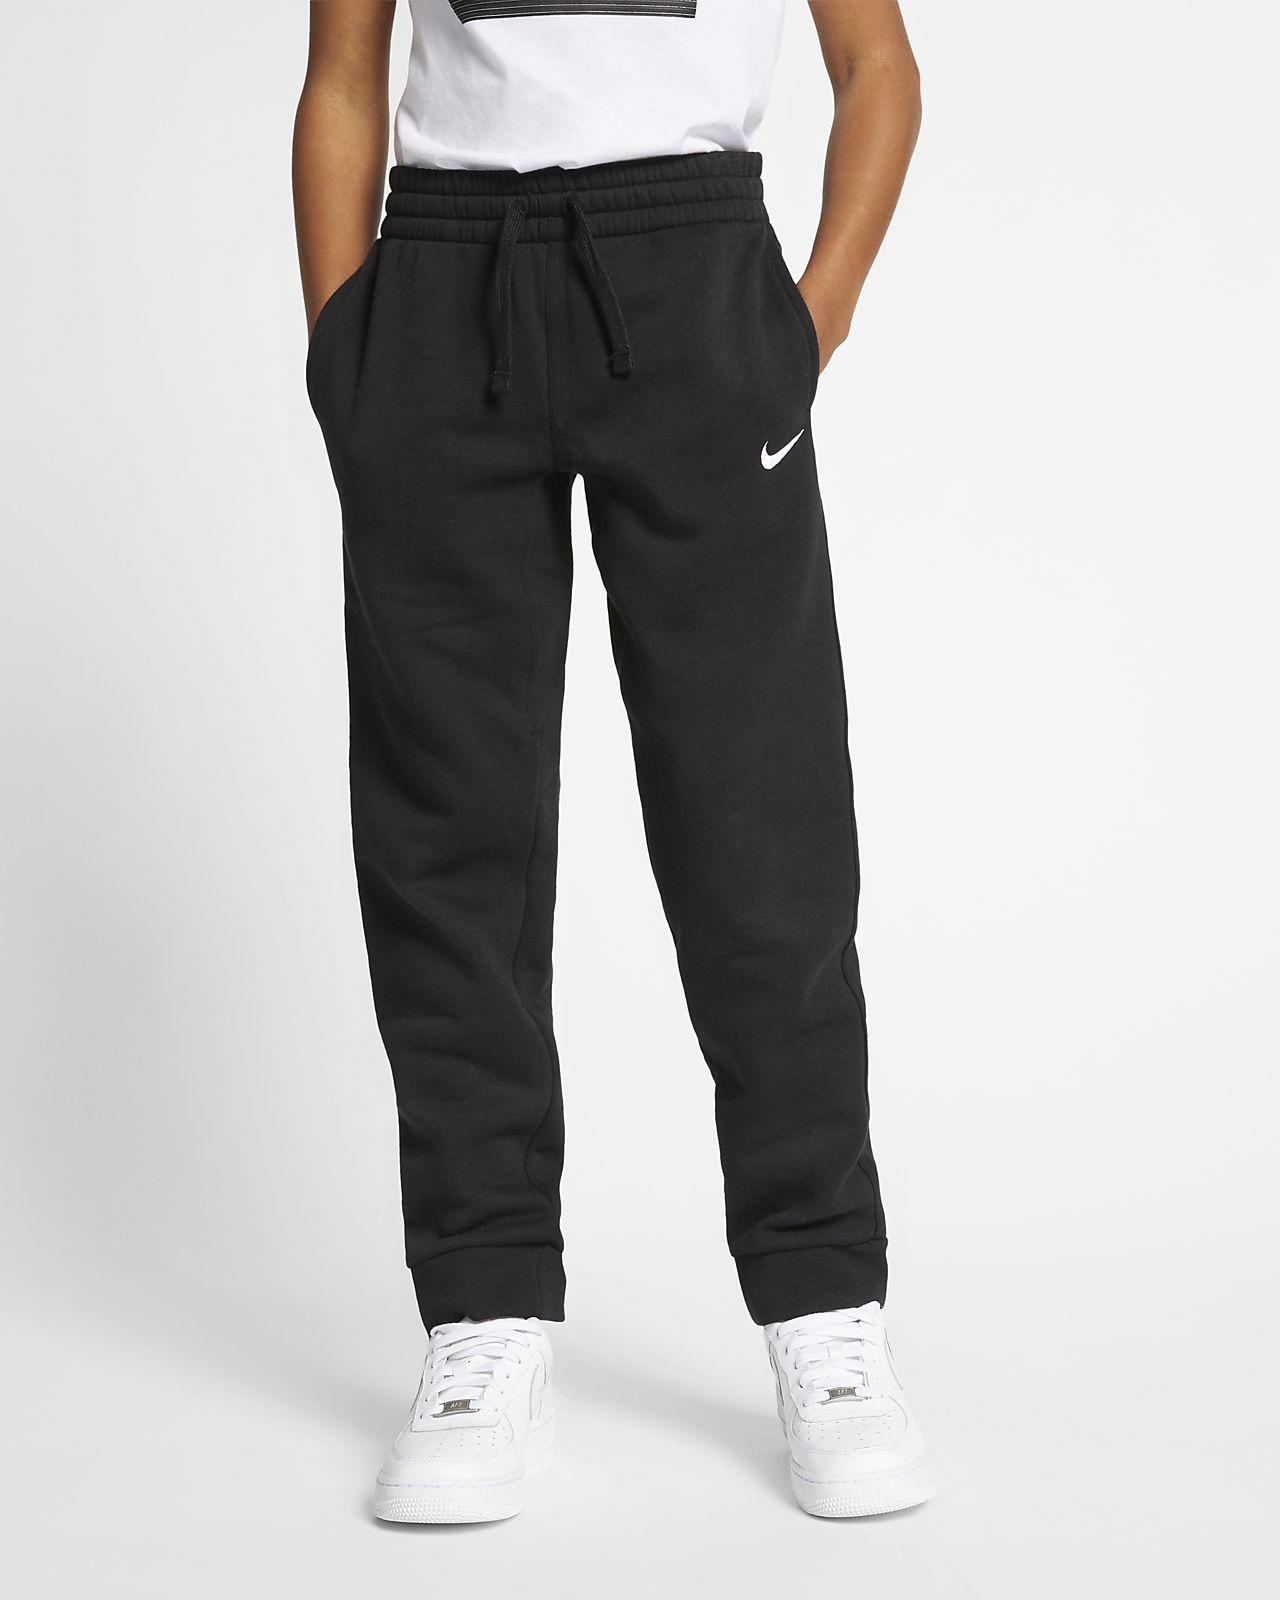 Pantalones para niños talla grande Nike